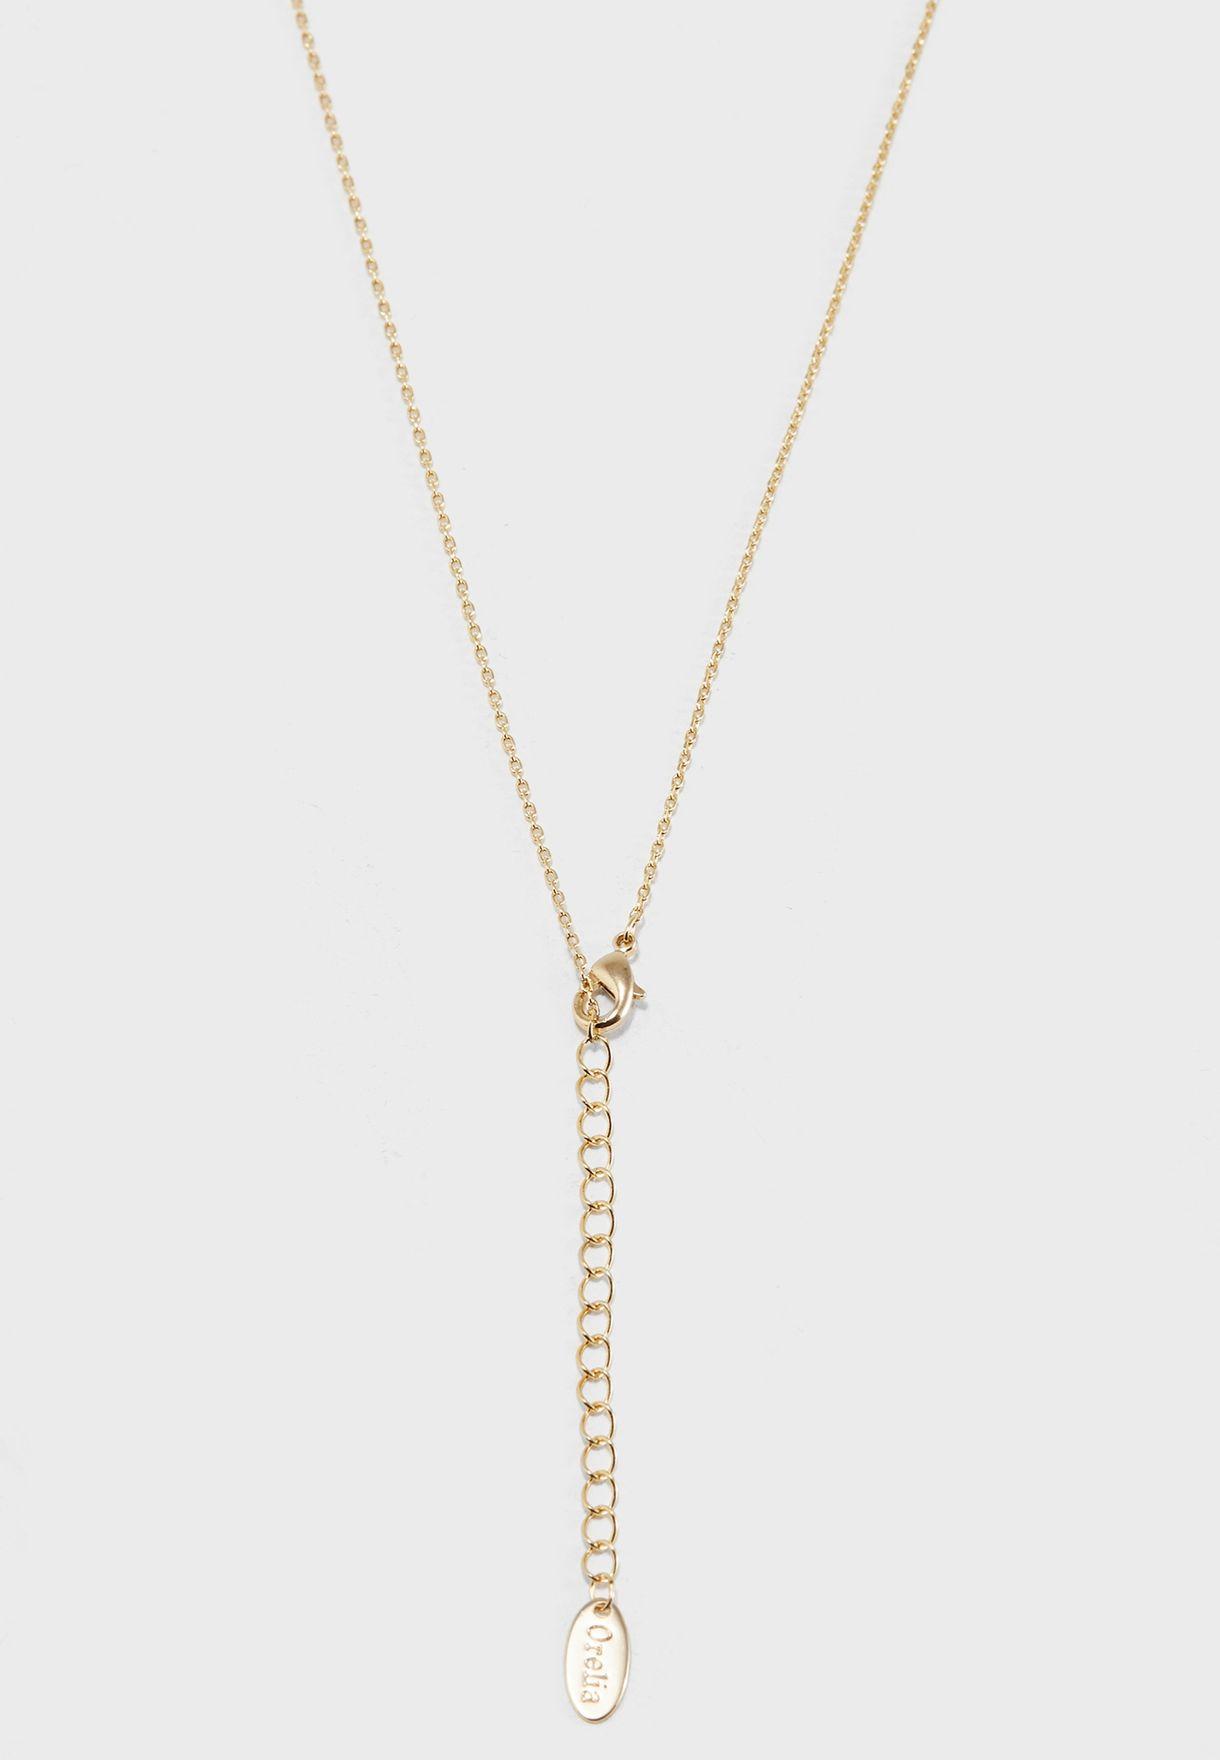 Gift Envelope Sagittarius Constellation Necklace